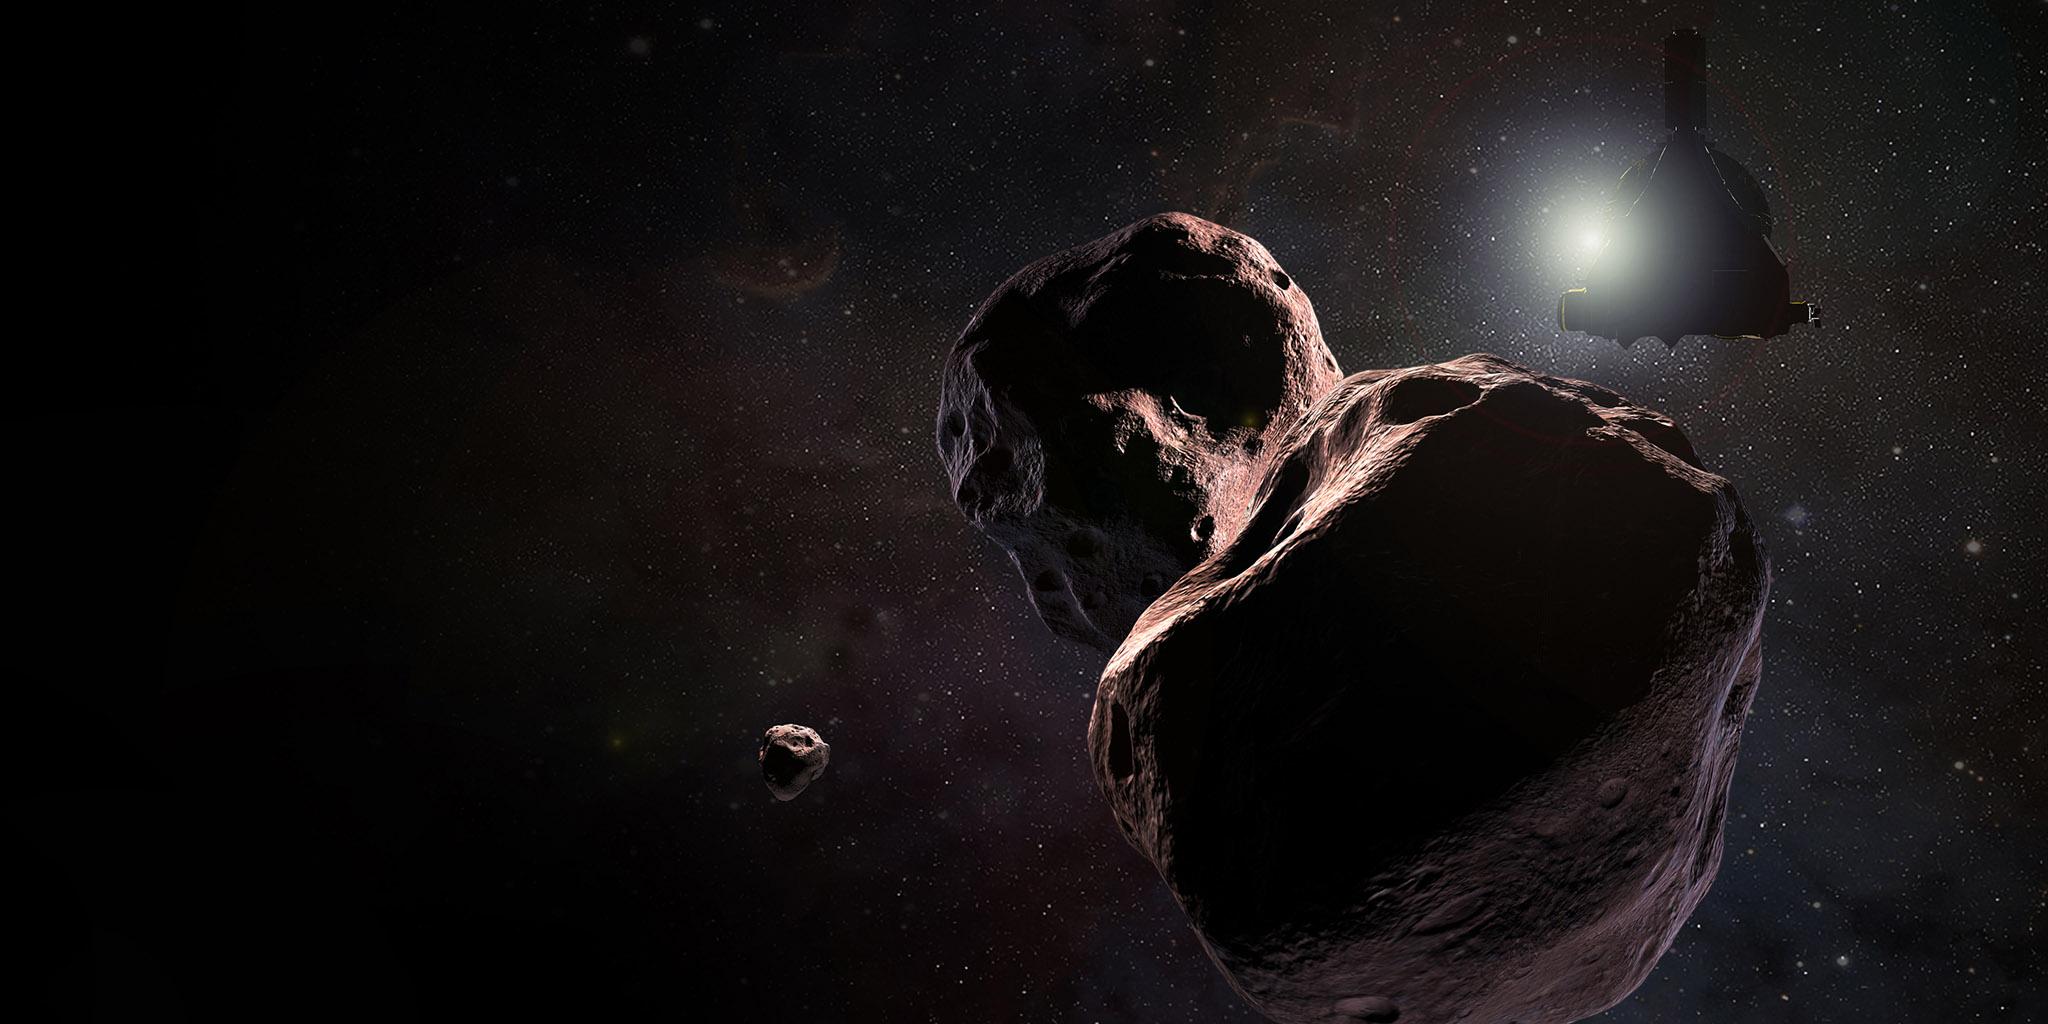 This artist's impression is of NASA's New Horizons spacecraft encountering 2014 MU69, a Kuiper Belt object that orbits one billion miles (1.6 billion kilometers) beyond Pluto, on Jan. 1, 2019.